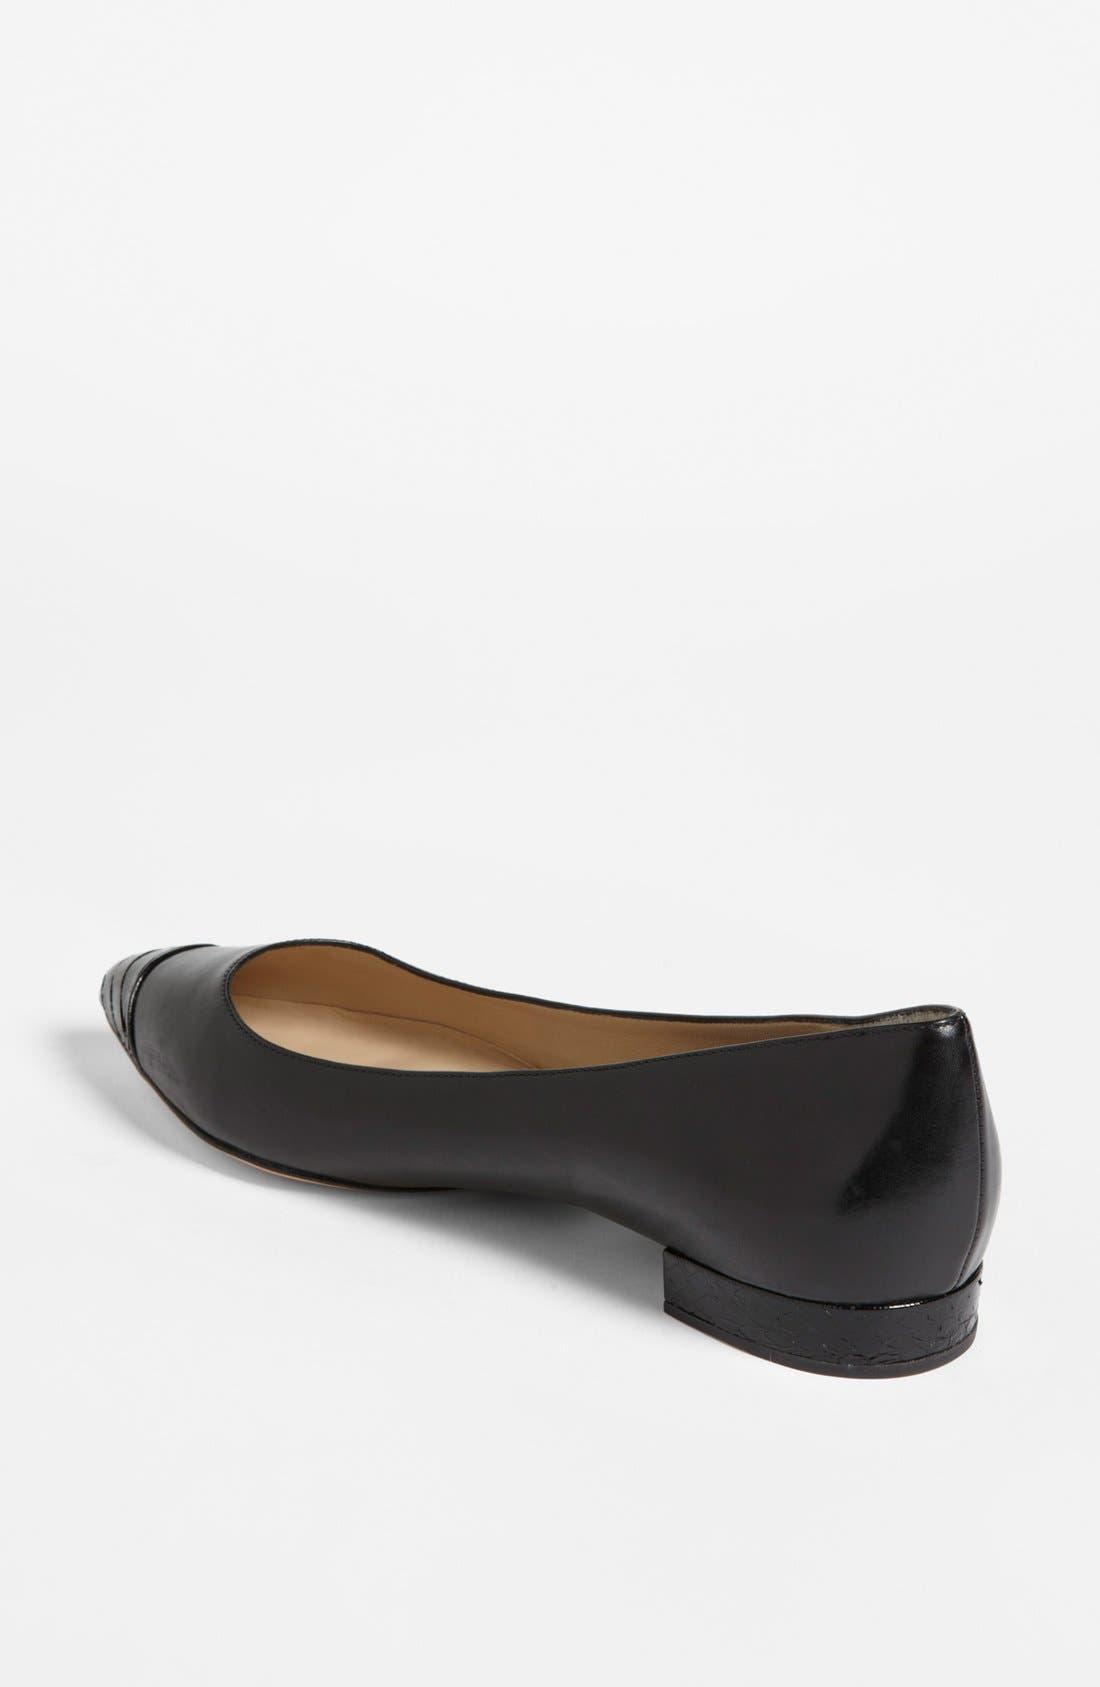 Alternate Image 2  - Michael Kors 'Janae' Loafer Flat